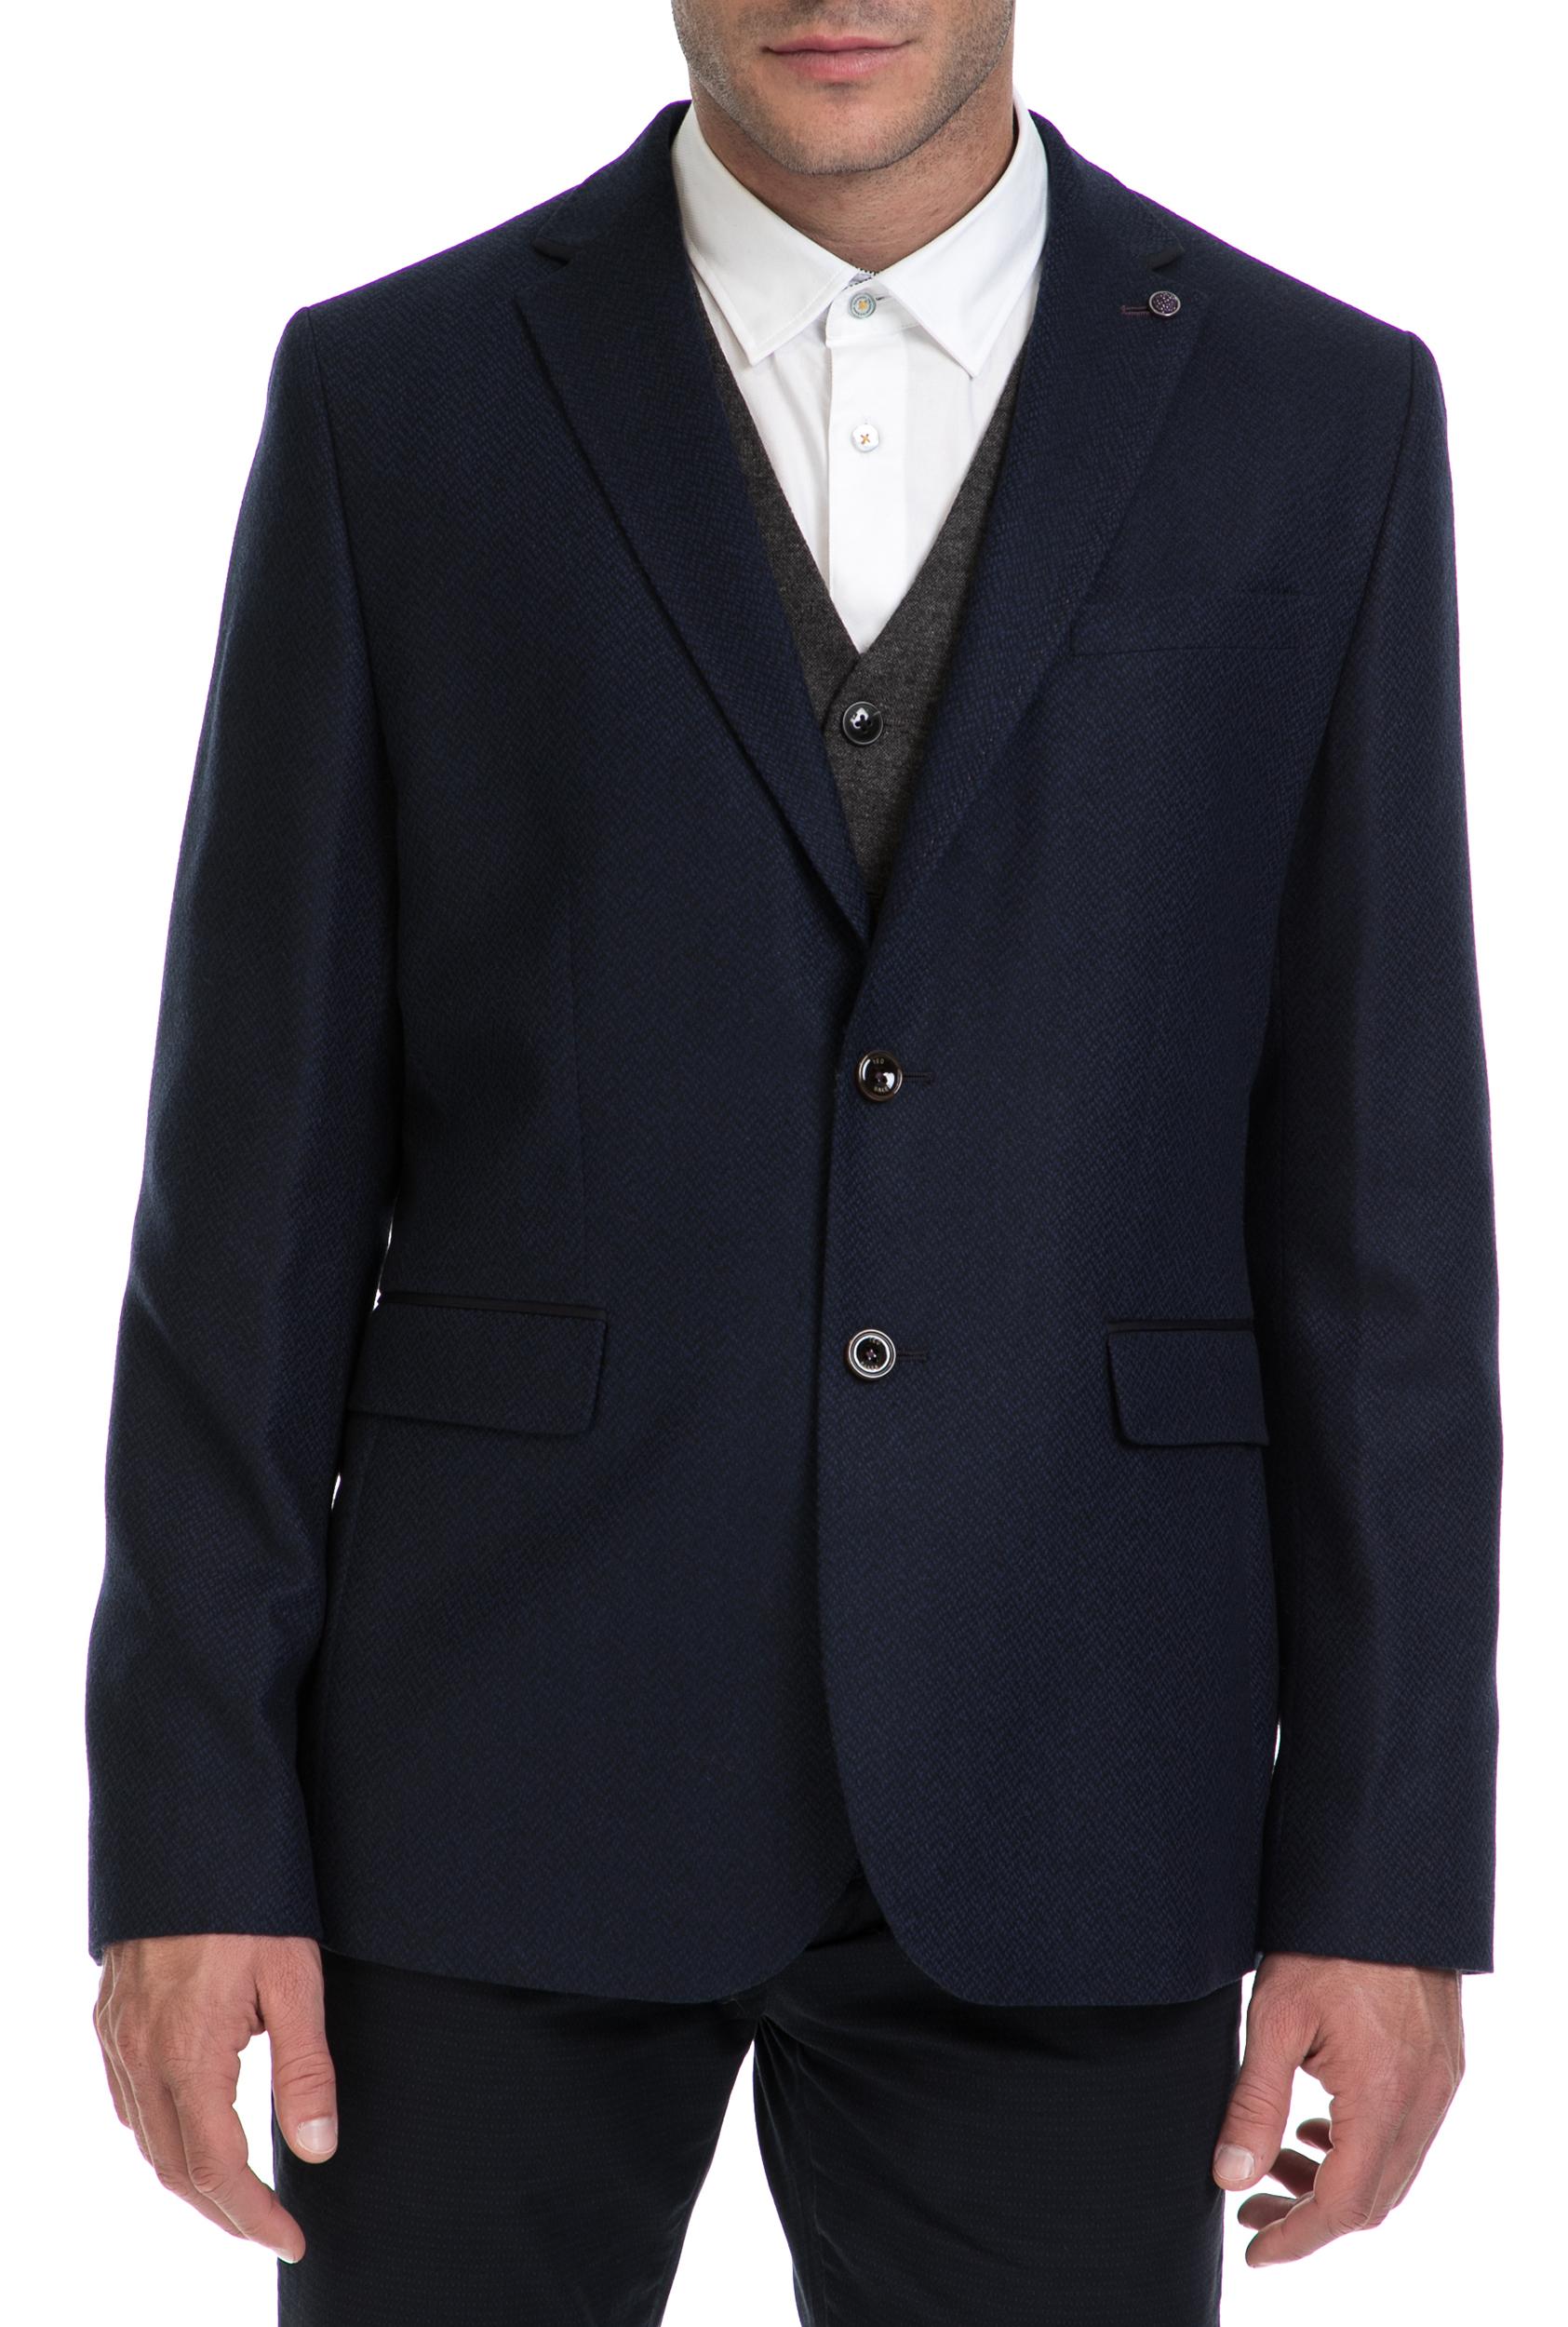 TED BAKER - Ανδρικό σακάκι GLEN TED BAKER μπλε ανδρικά ρούχα πανωφόρια σακάκια